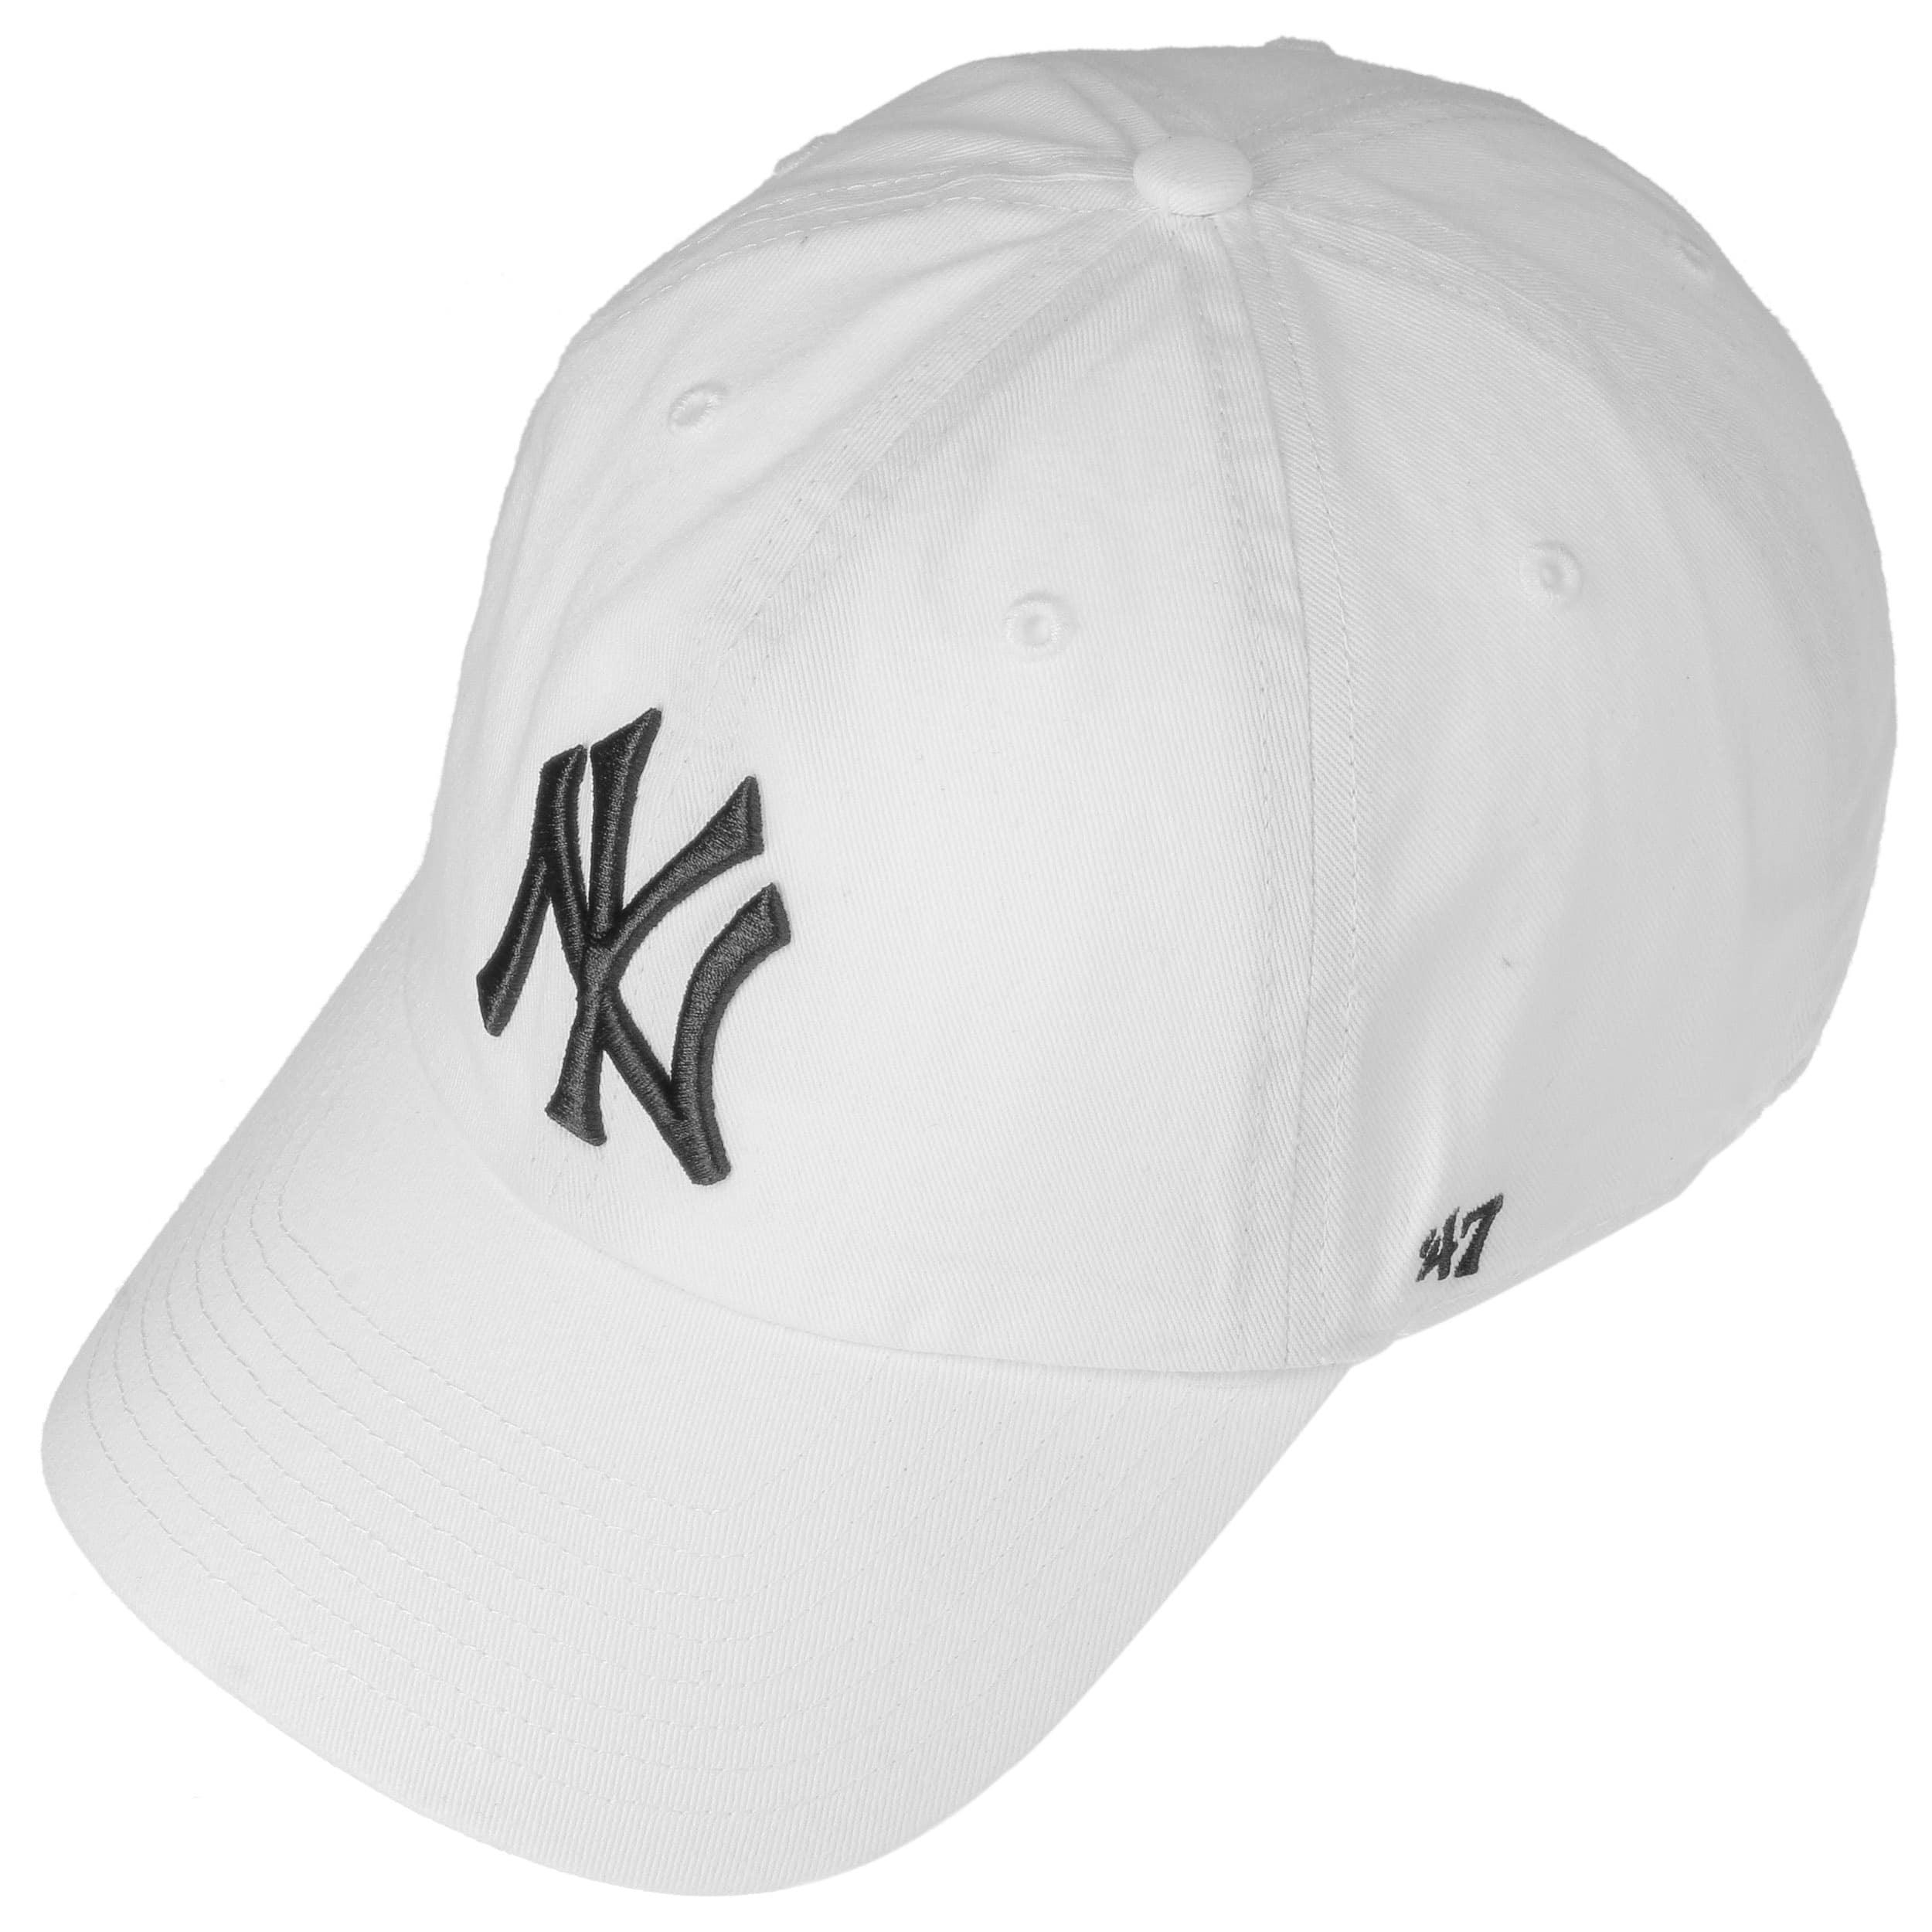 ... MVP Snapback Yankees Cap by 47 Brand - white 1 ... e35d51c0817